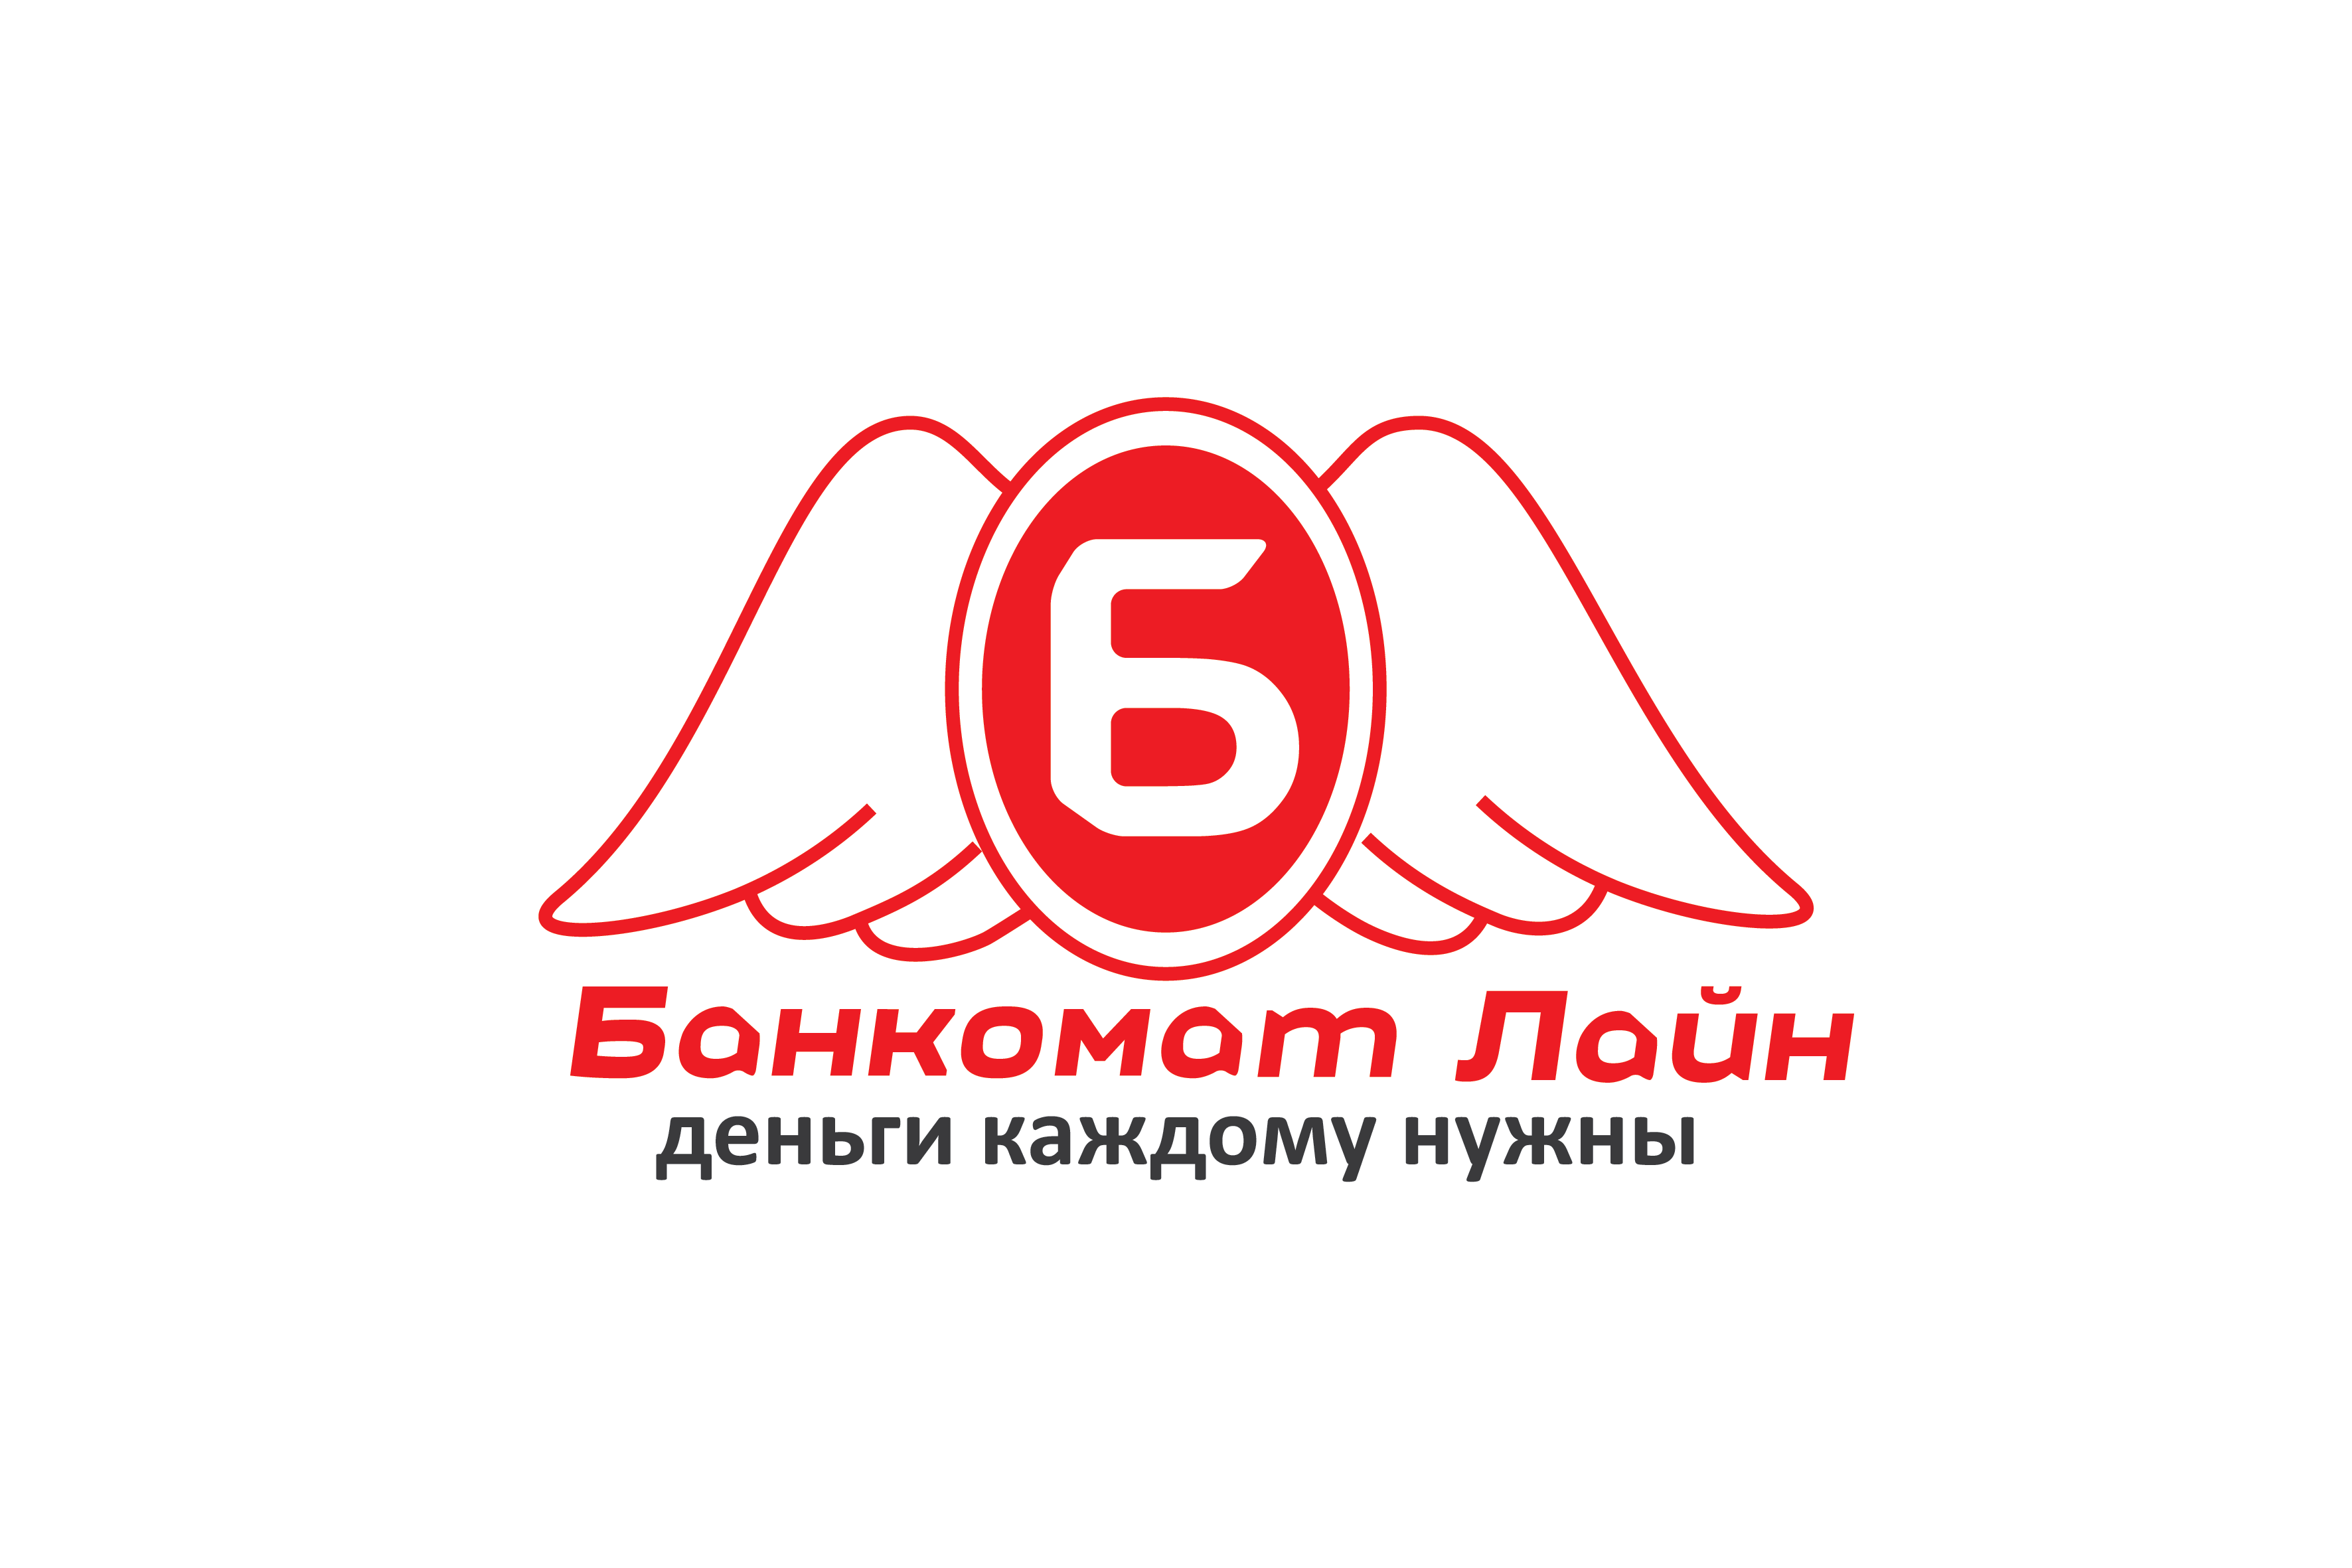 Разработка логотипа и слогана для транспортной компании фото f_9085878d772eeb3e.png